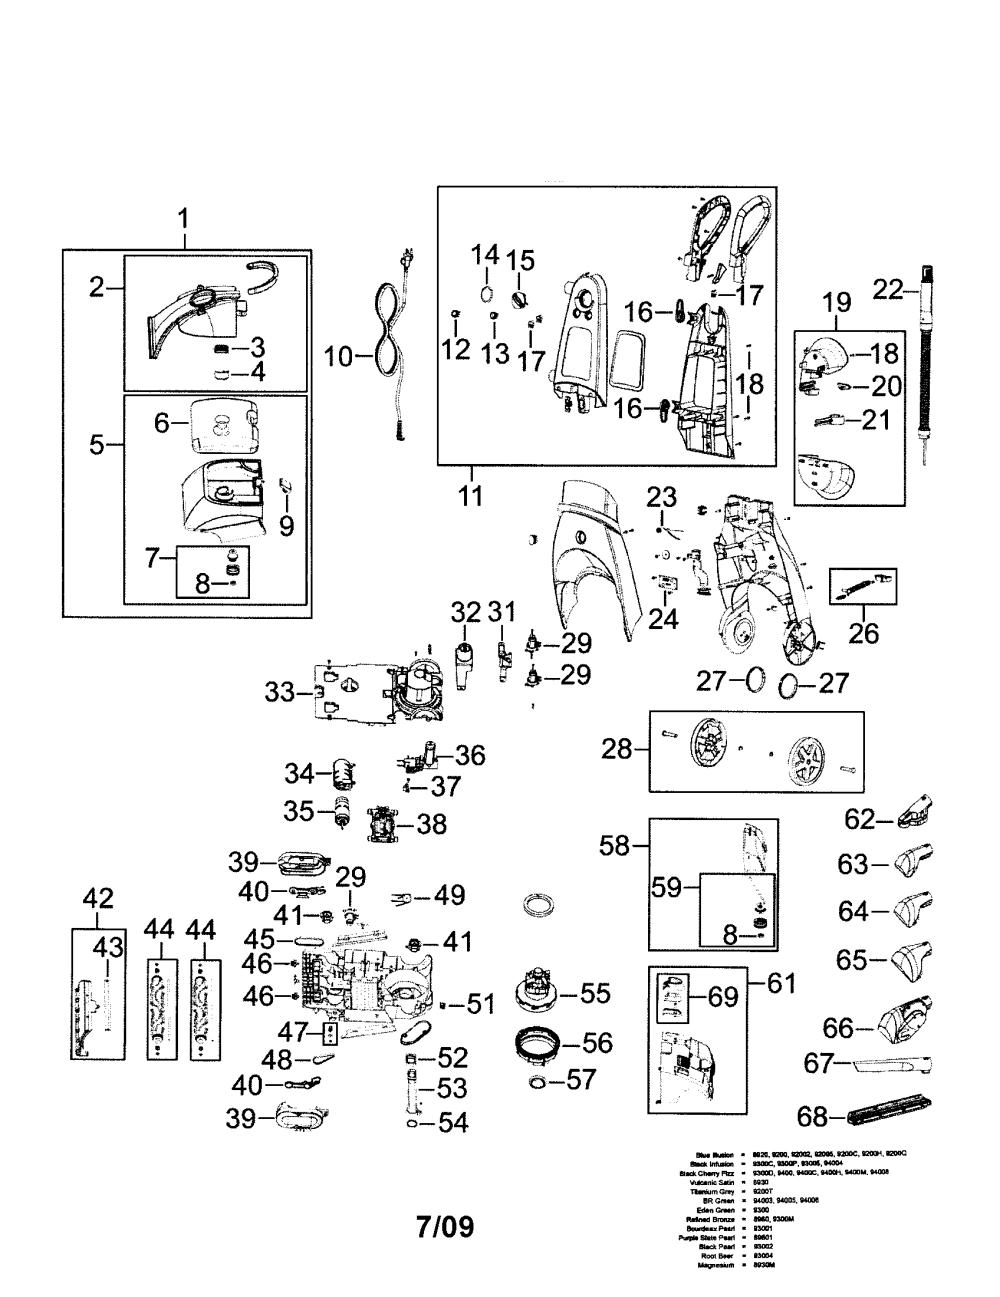 medium resolution of bissell model 9200 power steamer genuine parts schematics diagrams electrolux vacuum bissell vacuum cleaner wiring diagram